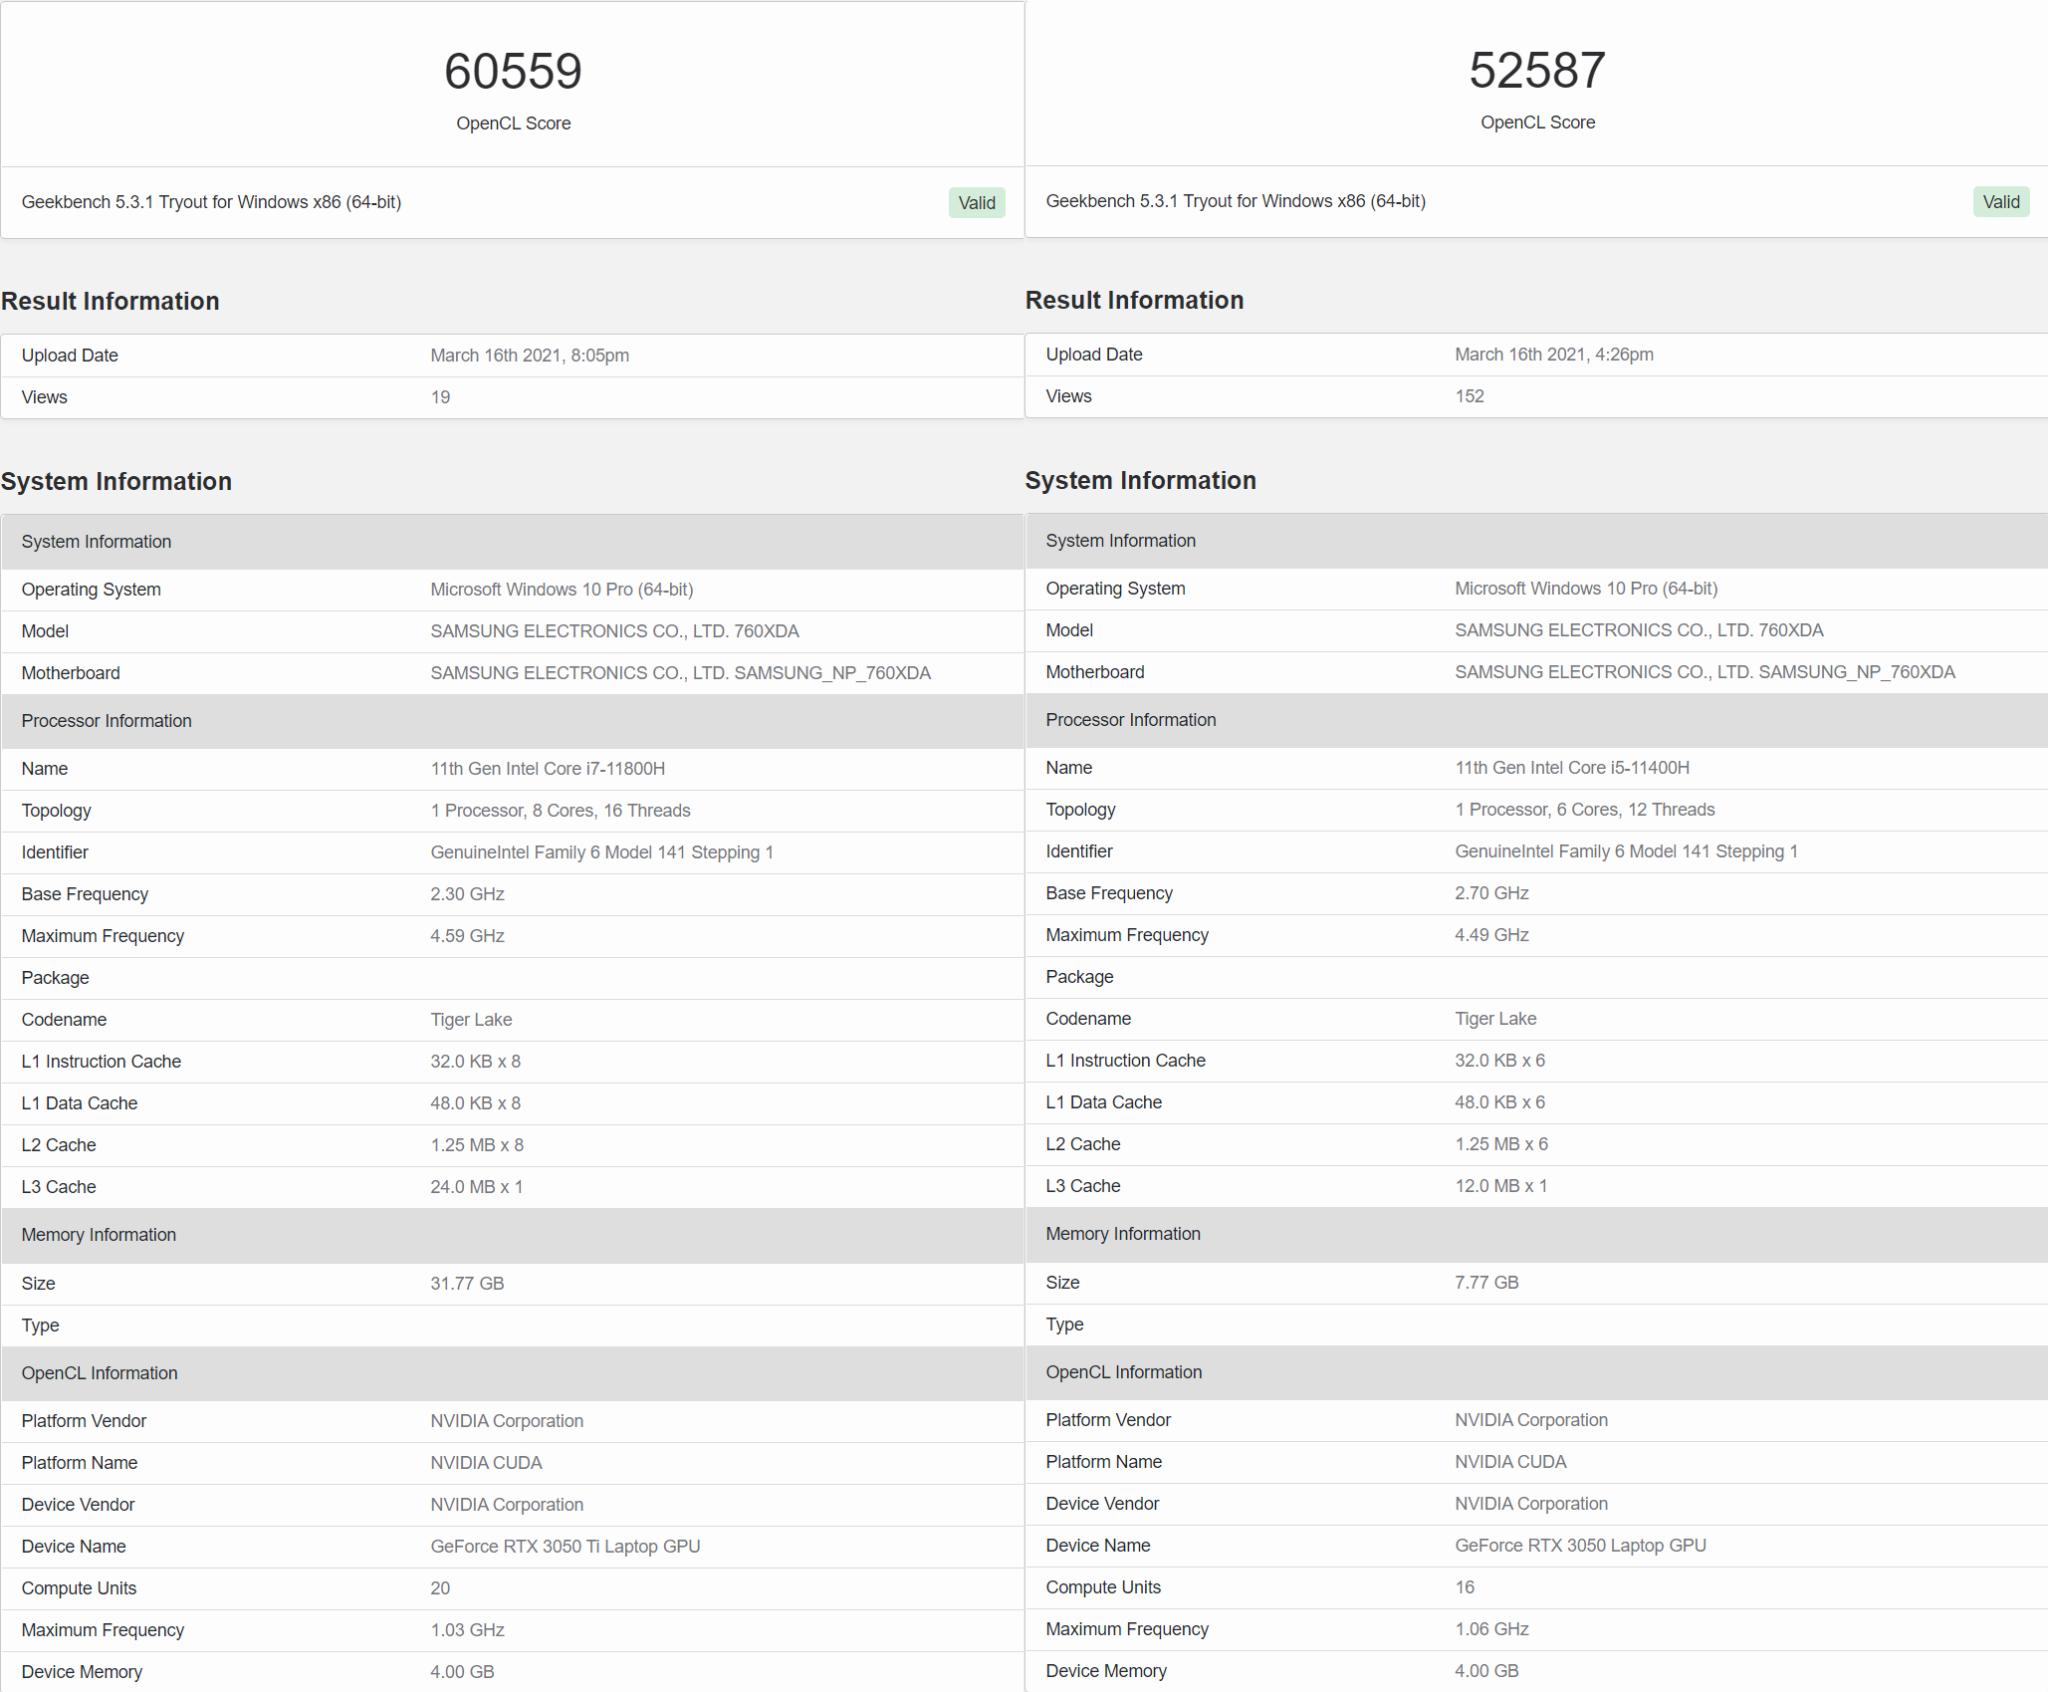 NVIDIA-GeForce-RTX-3050-Ti-GeForce-RTX-3050-Ampere-GA107-4-GB-GPUs-With-Intel-Core-i7-11800H-Core-i5-11400H-Tiger-Lake-CPUs